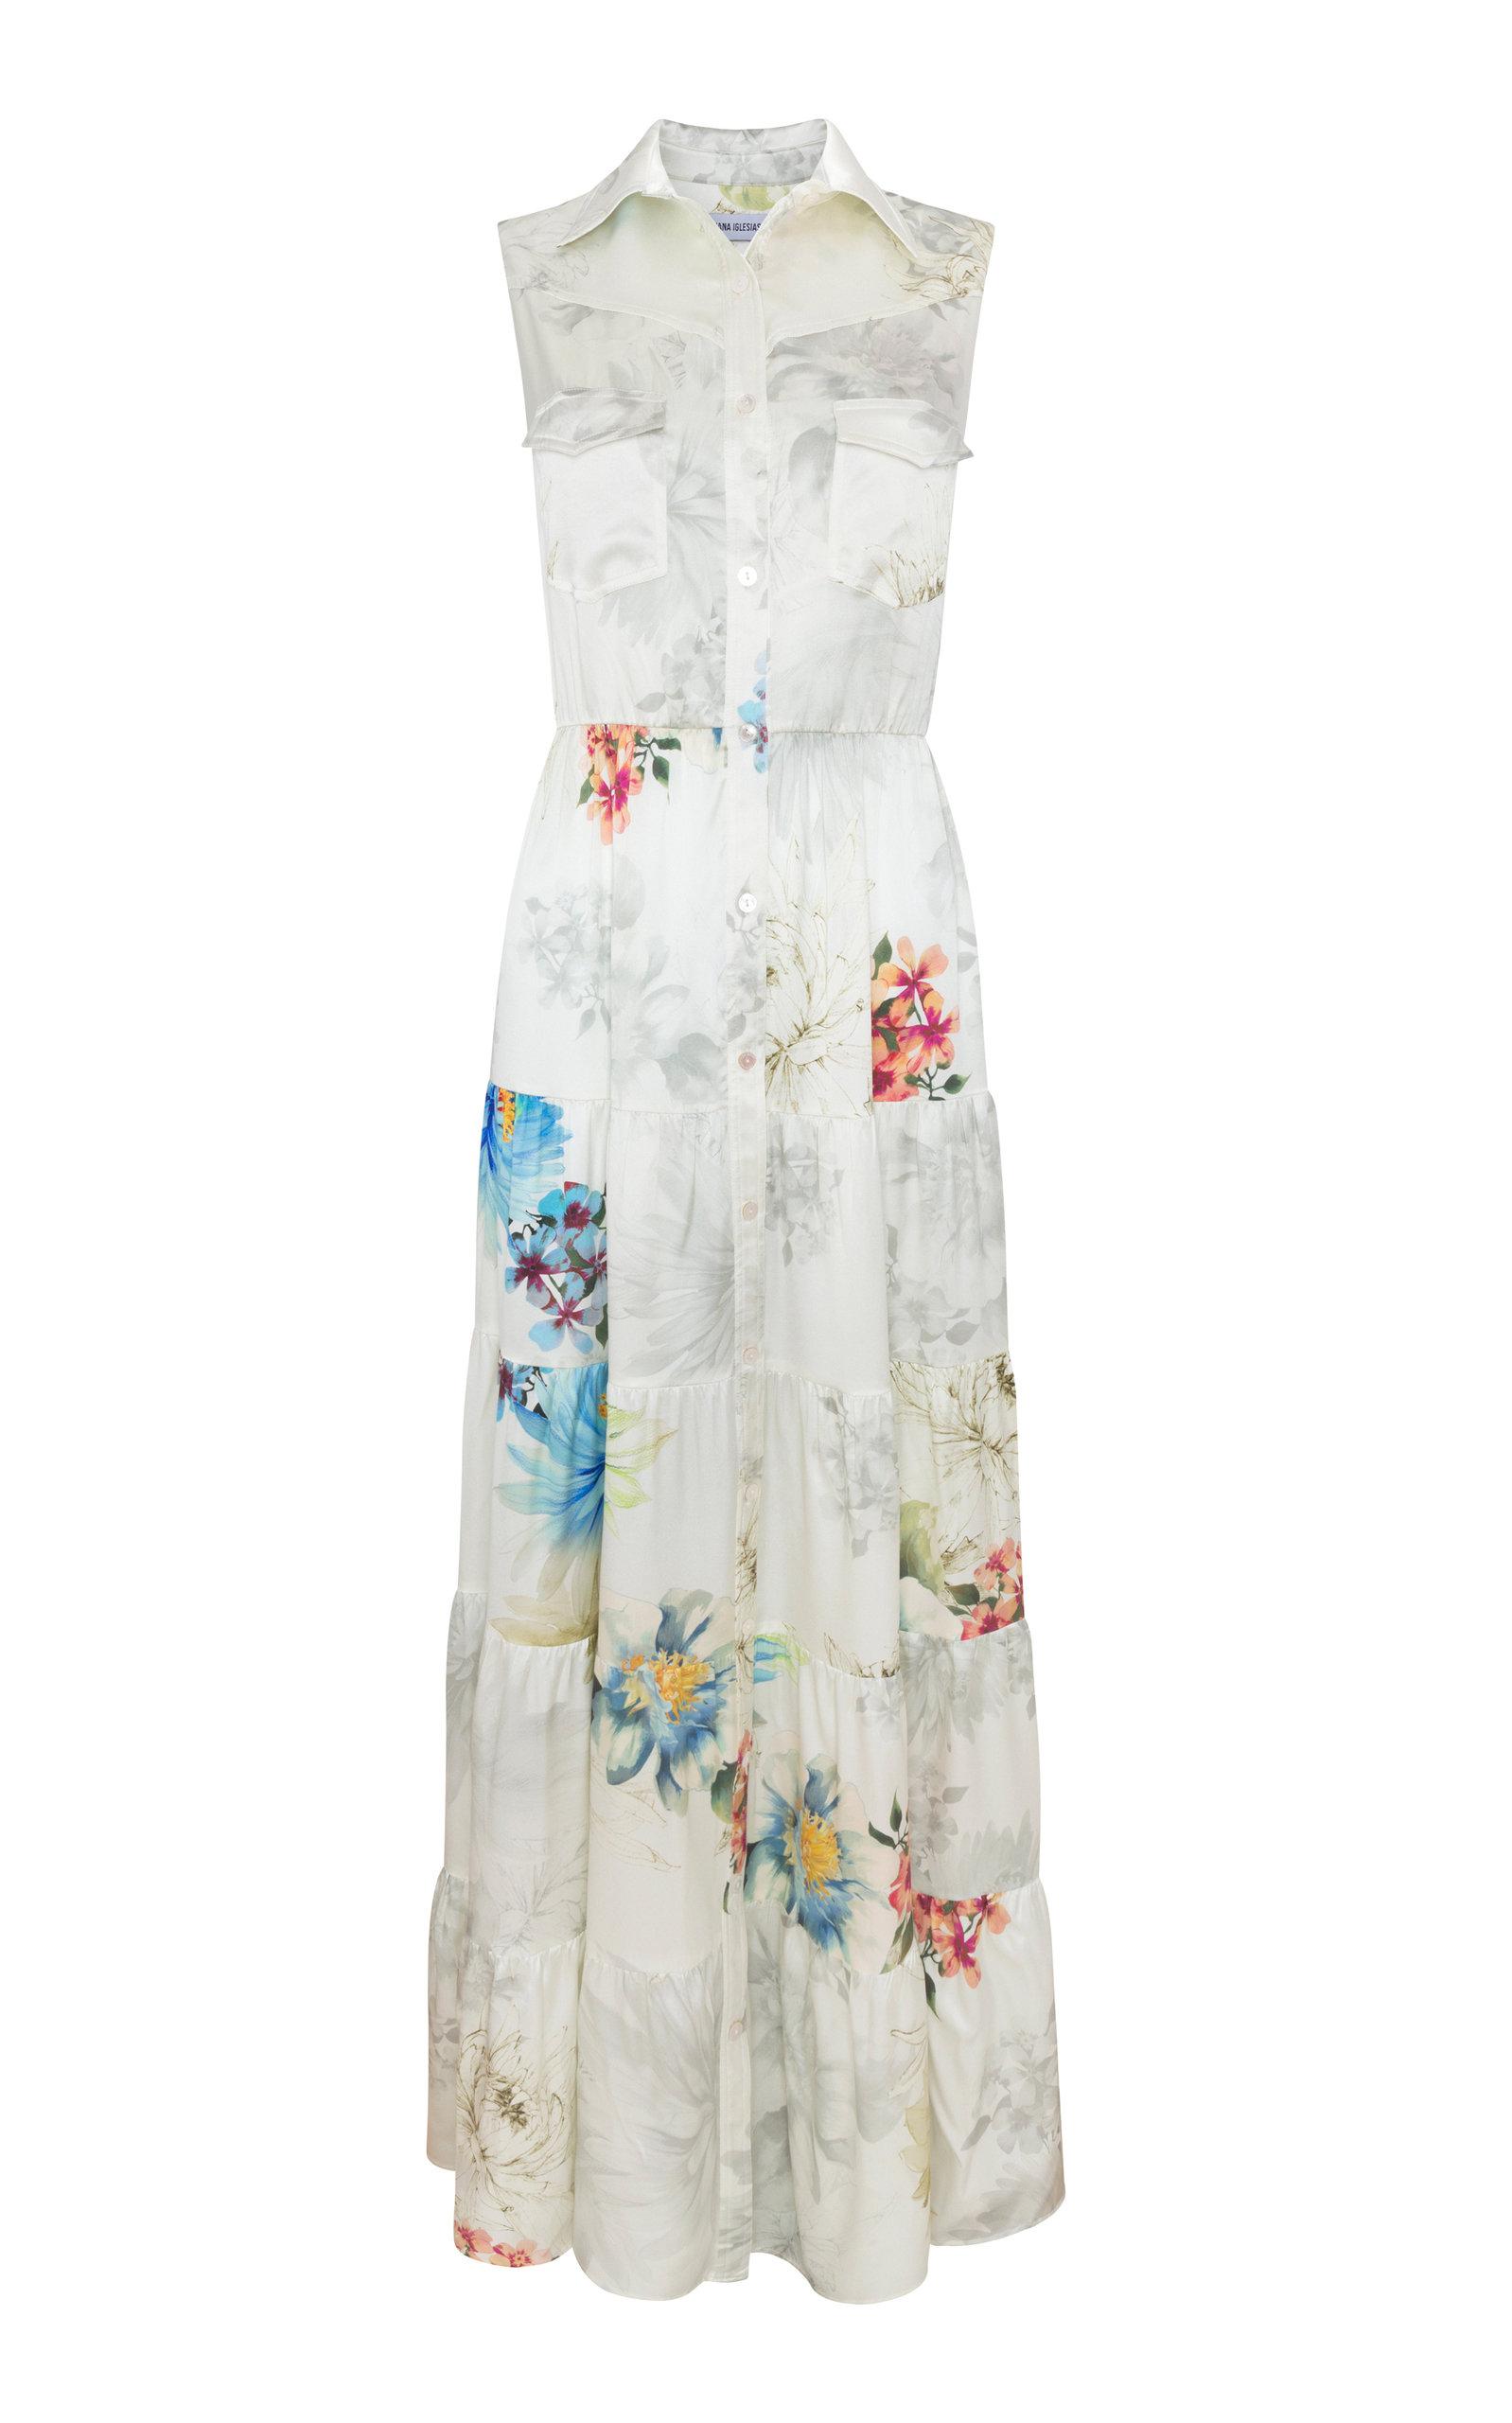 Tucson Floral Silk Satin Dress By Adriana Iglesias Moda Operandi